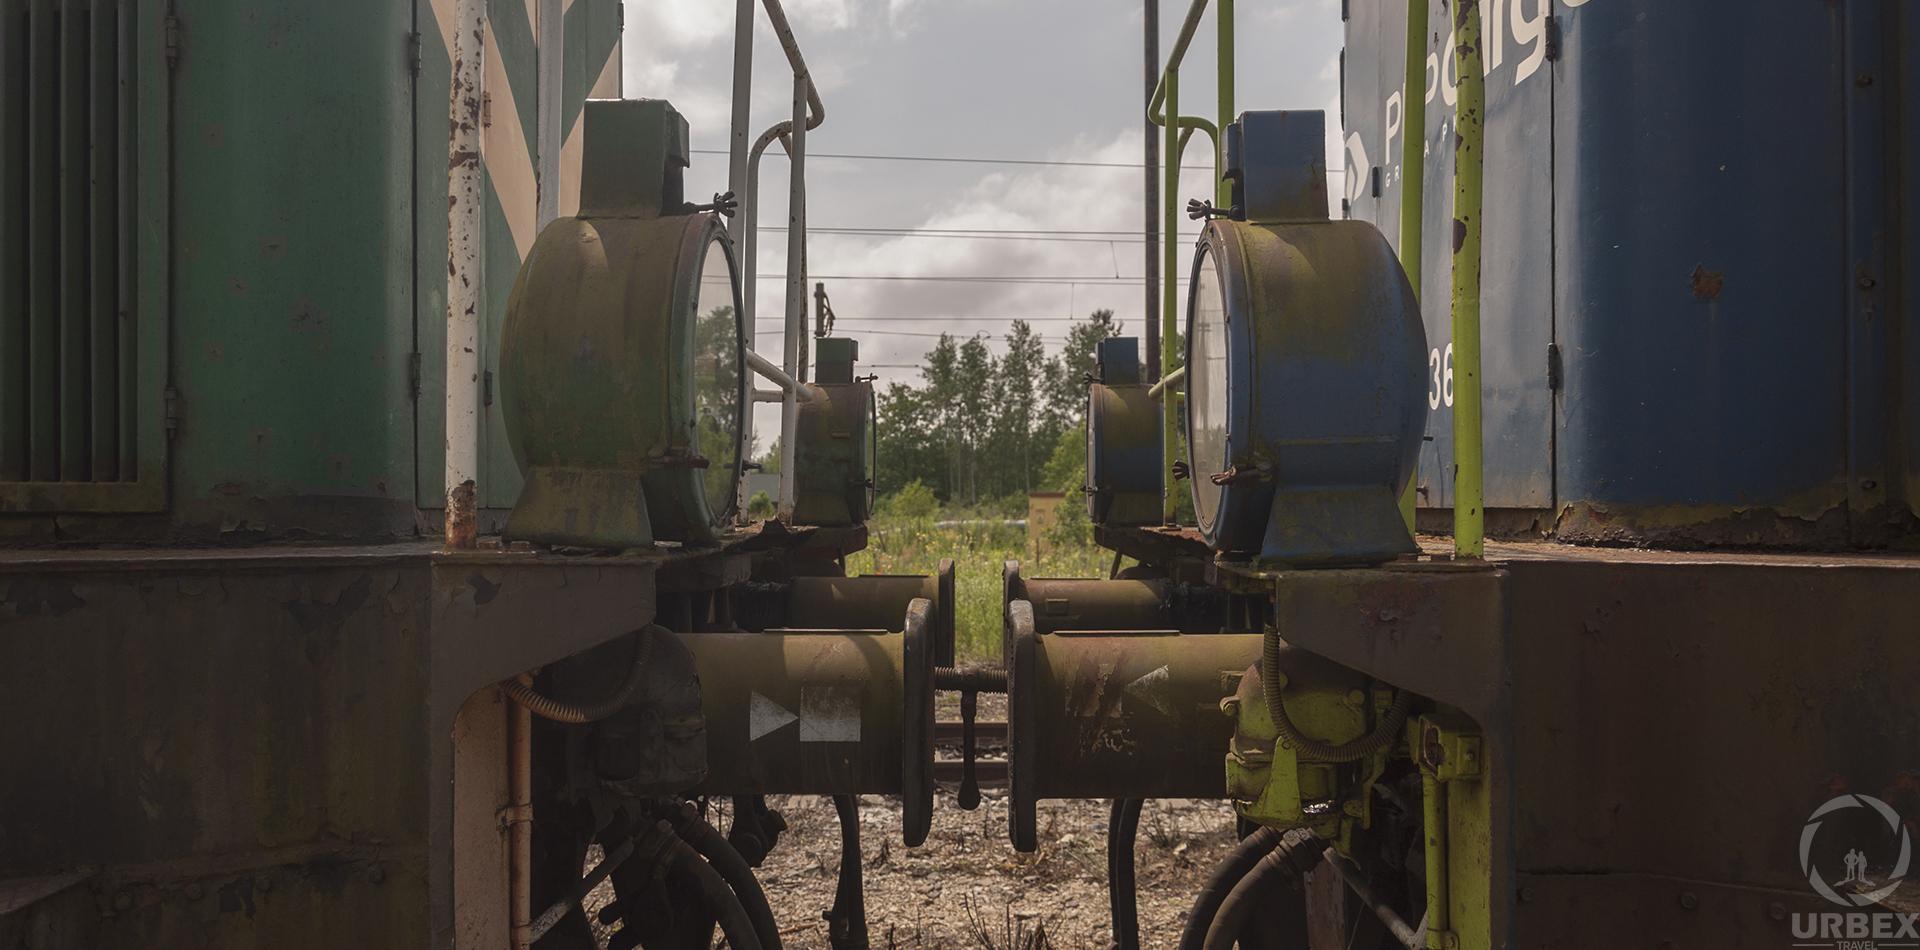 The Train Graveyard In Łódź